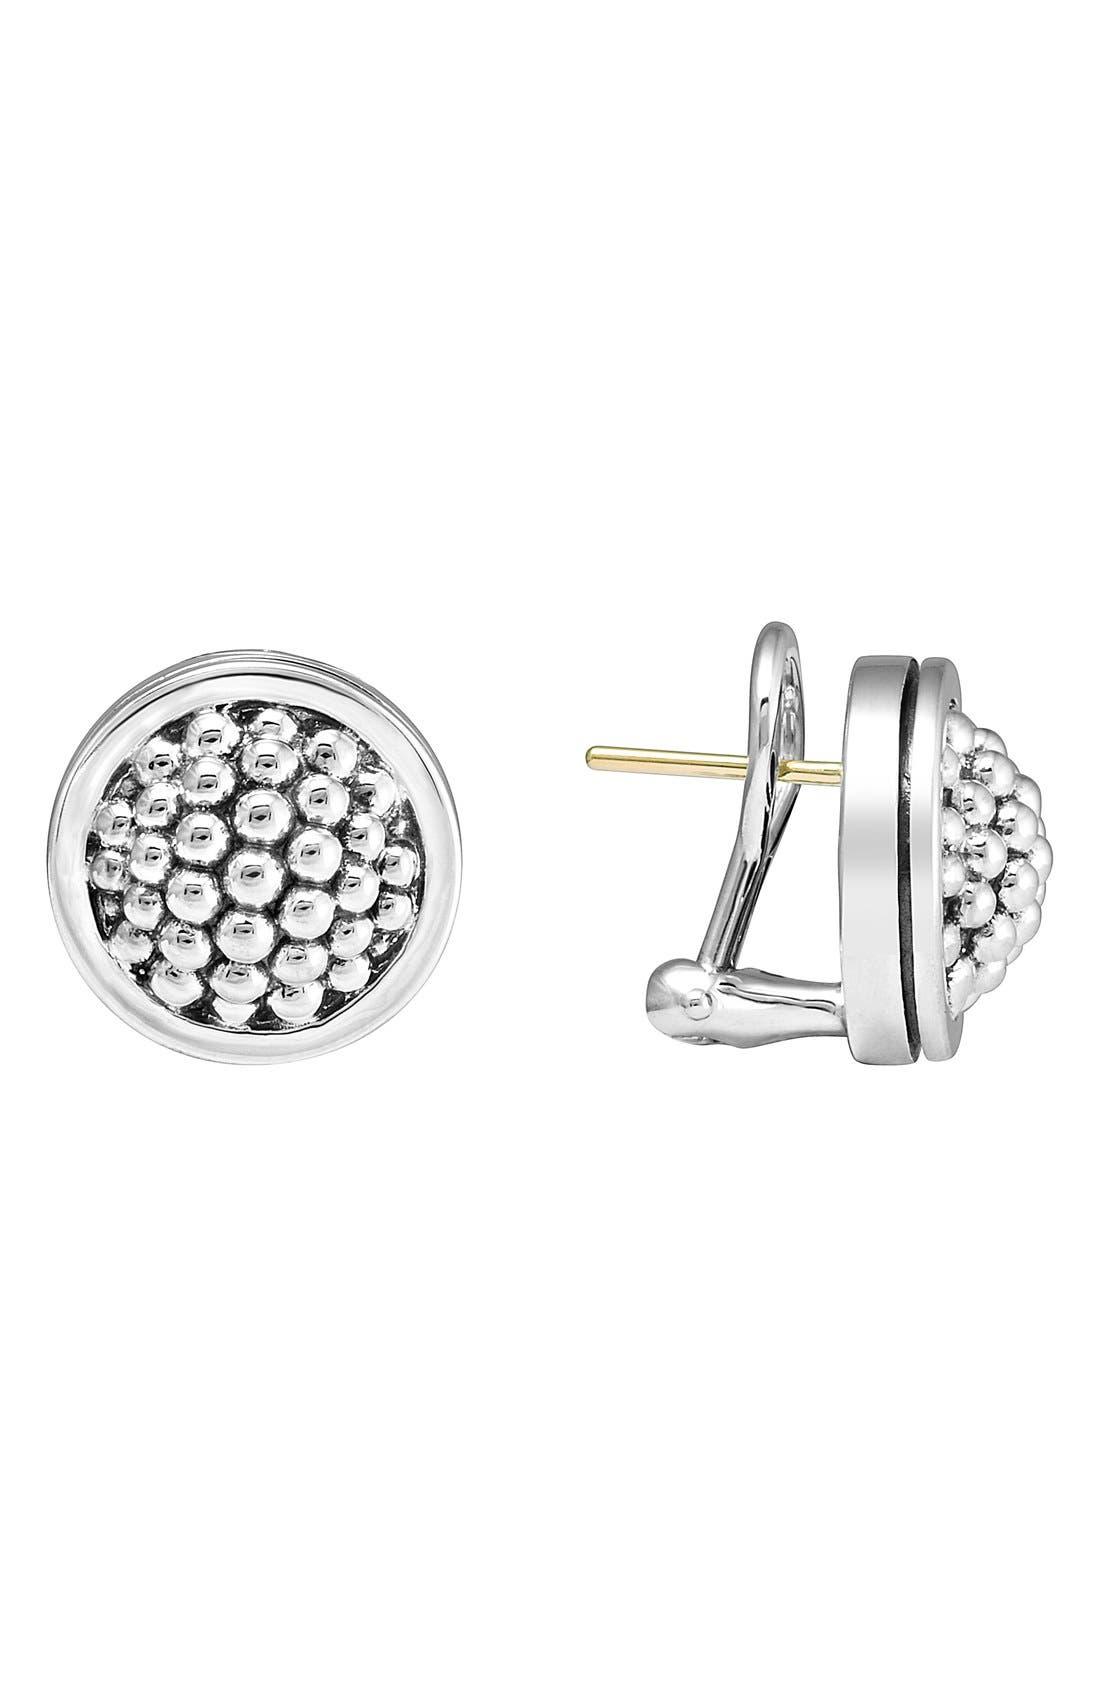 Caviar Stud Earrings,                             Main thumbnail 1, color,                             STERLING SILVER